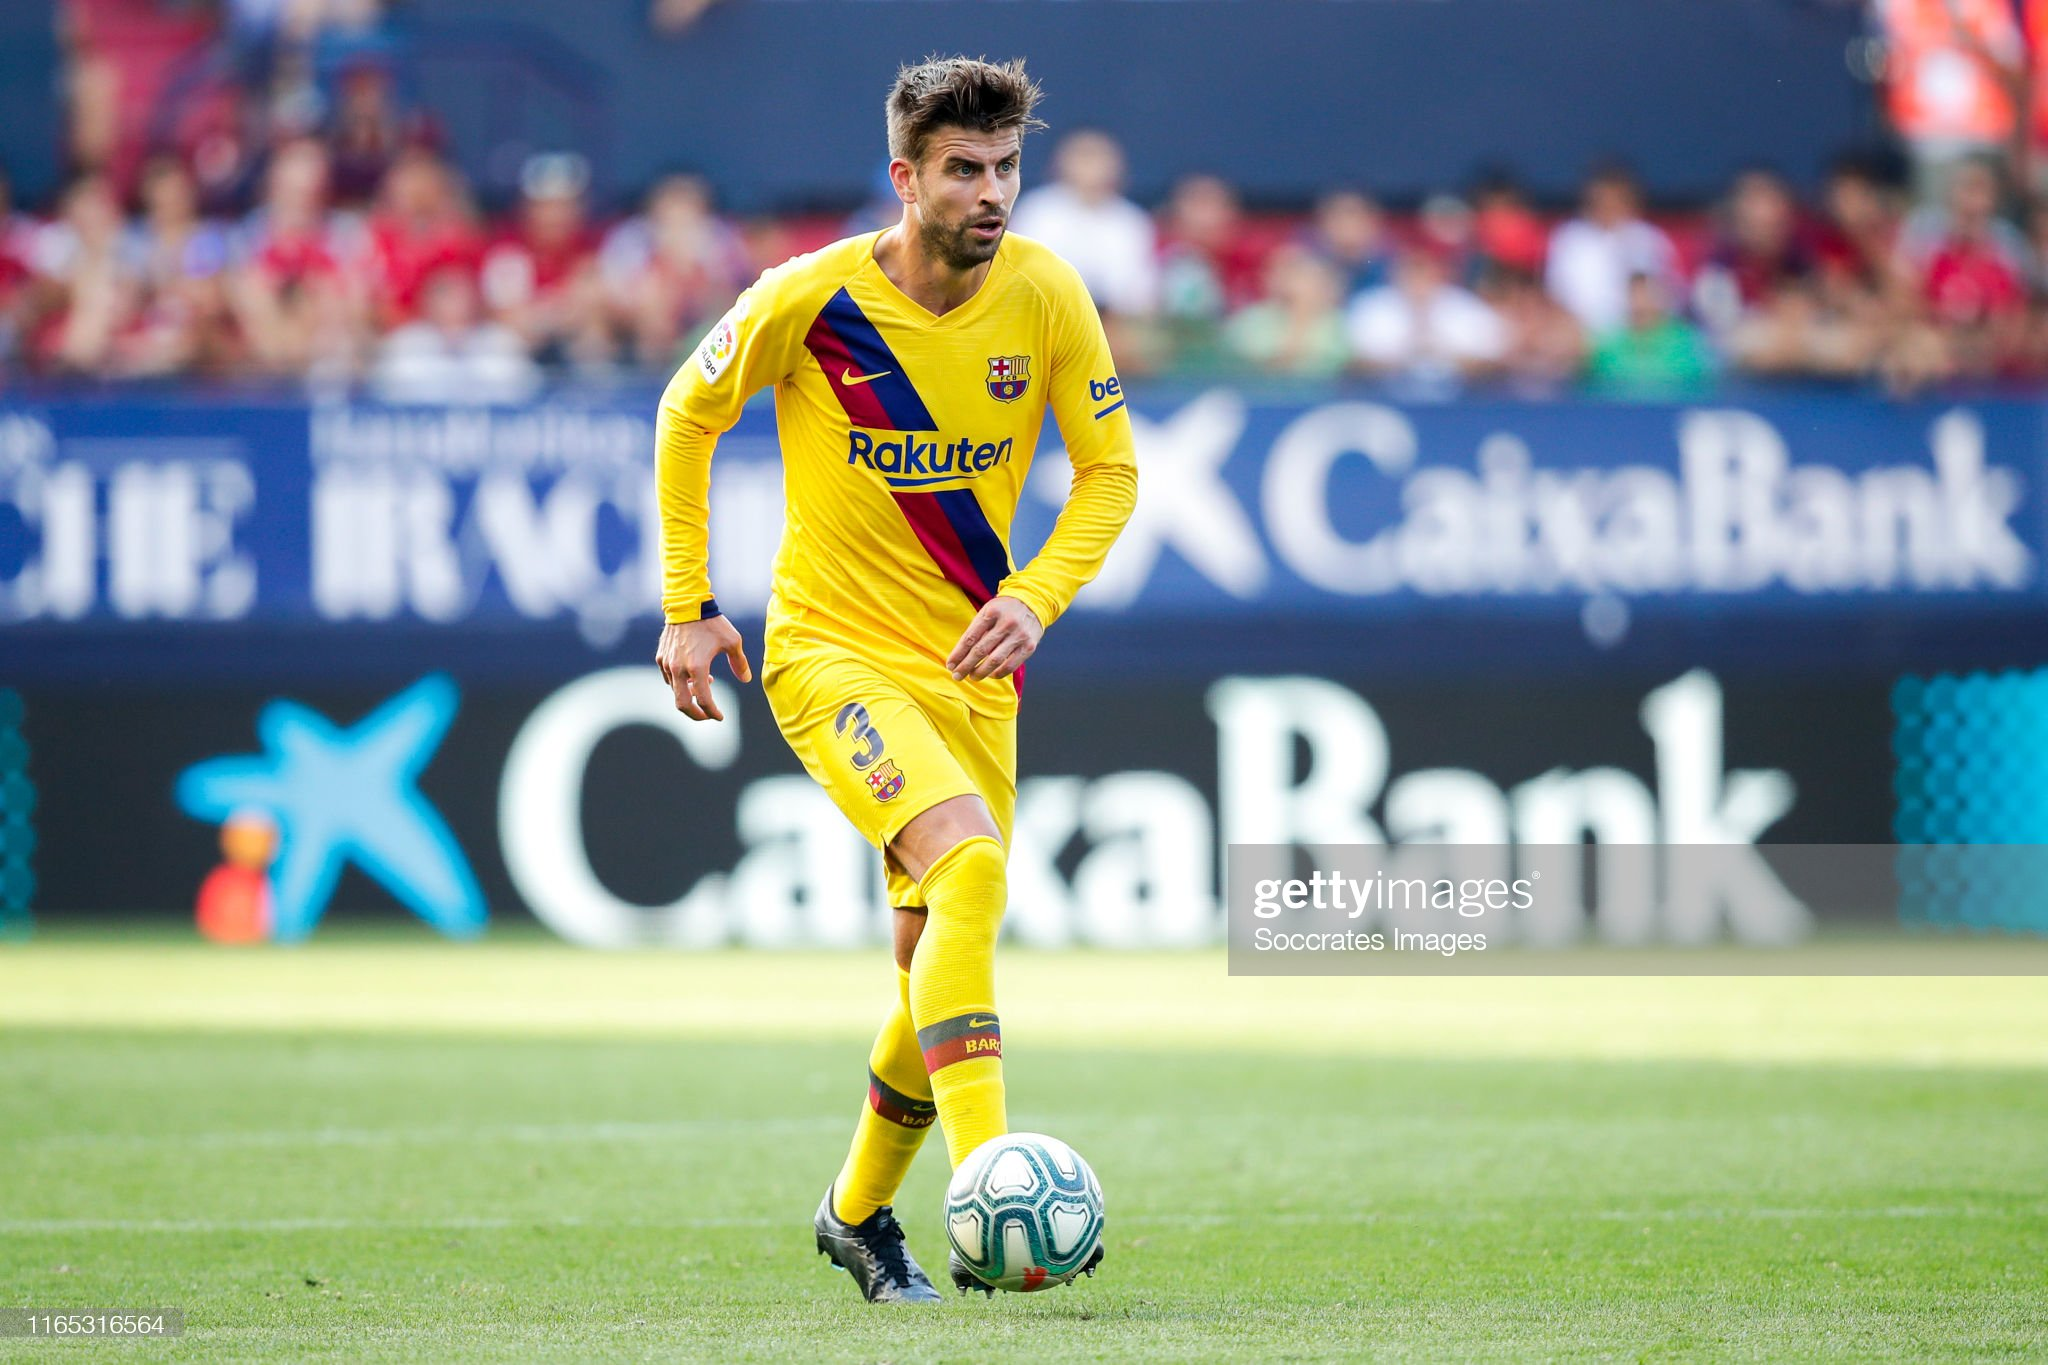 صور مباراة : أوساسونا - برشلونة 2-2 ( 31-08-2019 )  Gerard-pique-of-fc-barcelona-during-the-la-liga-santander-match-v-picture-id1165316564?s=2048x2048